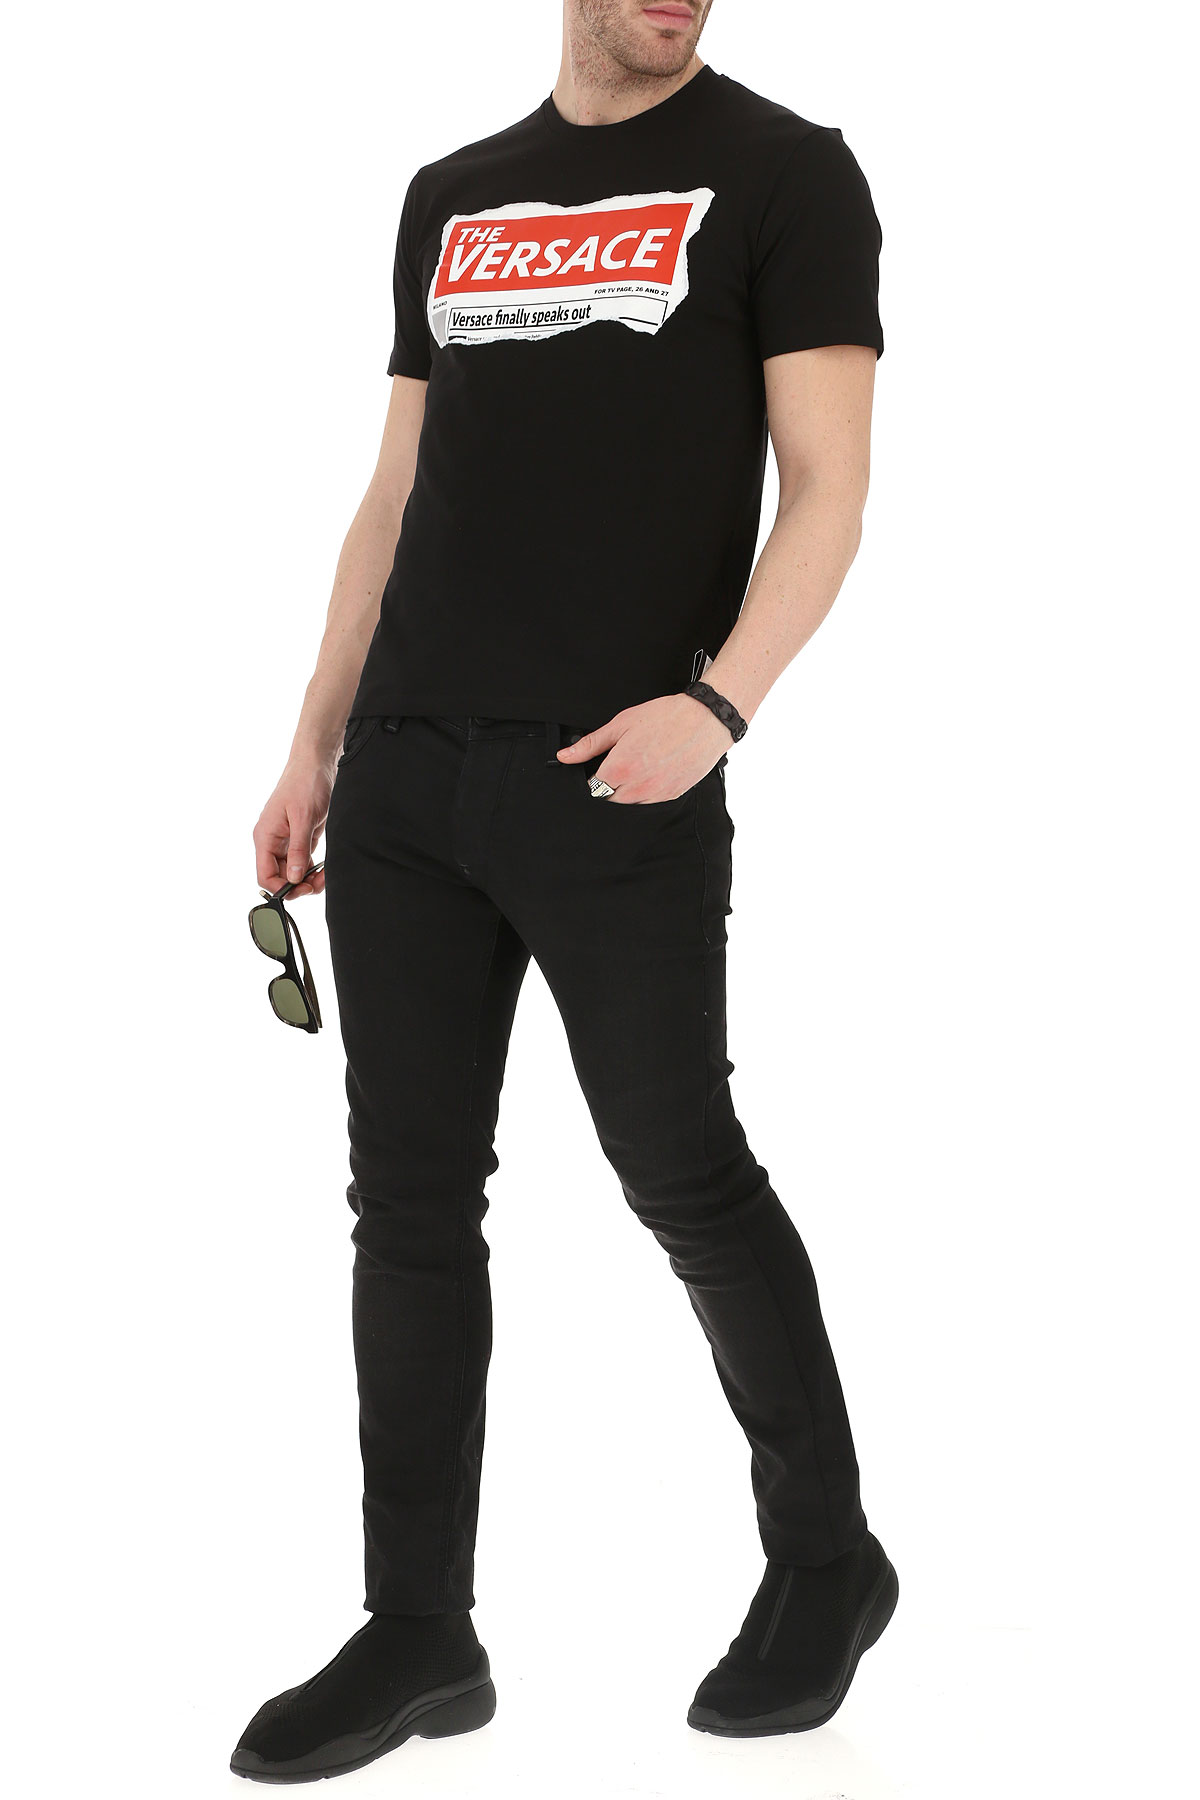 Hombres Para Primavera Versace Negro verano nbsp;blanco Rojo 2019 Ropa ZxT5Ttwq